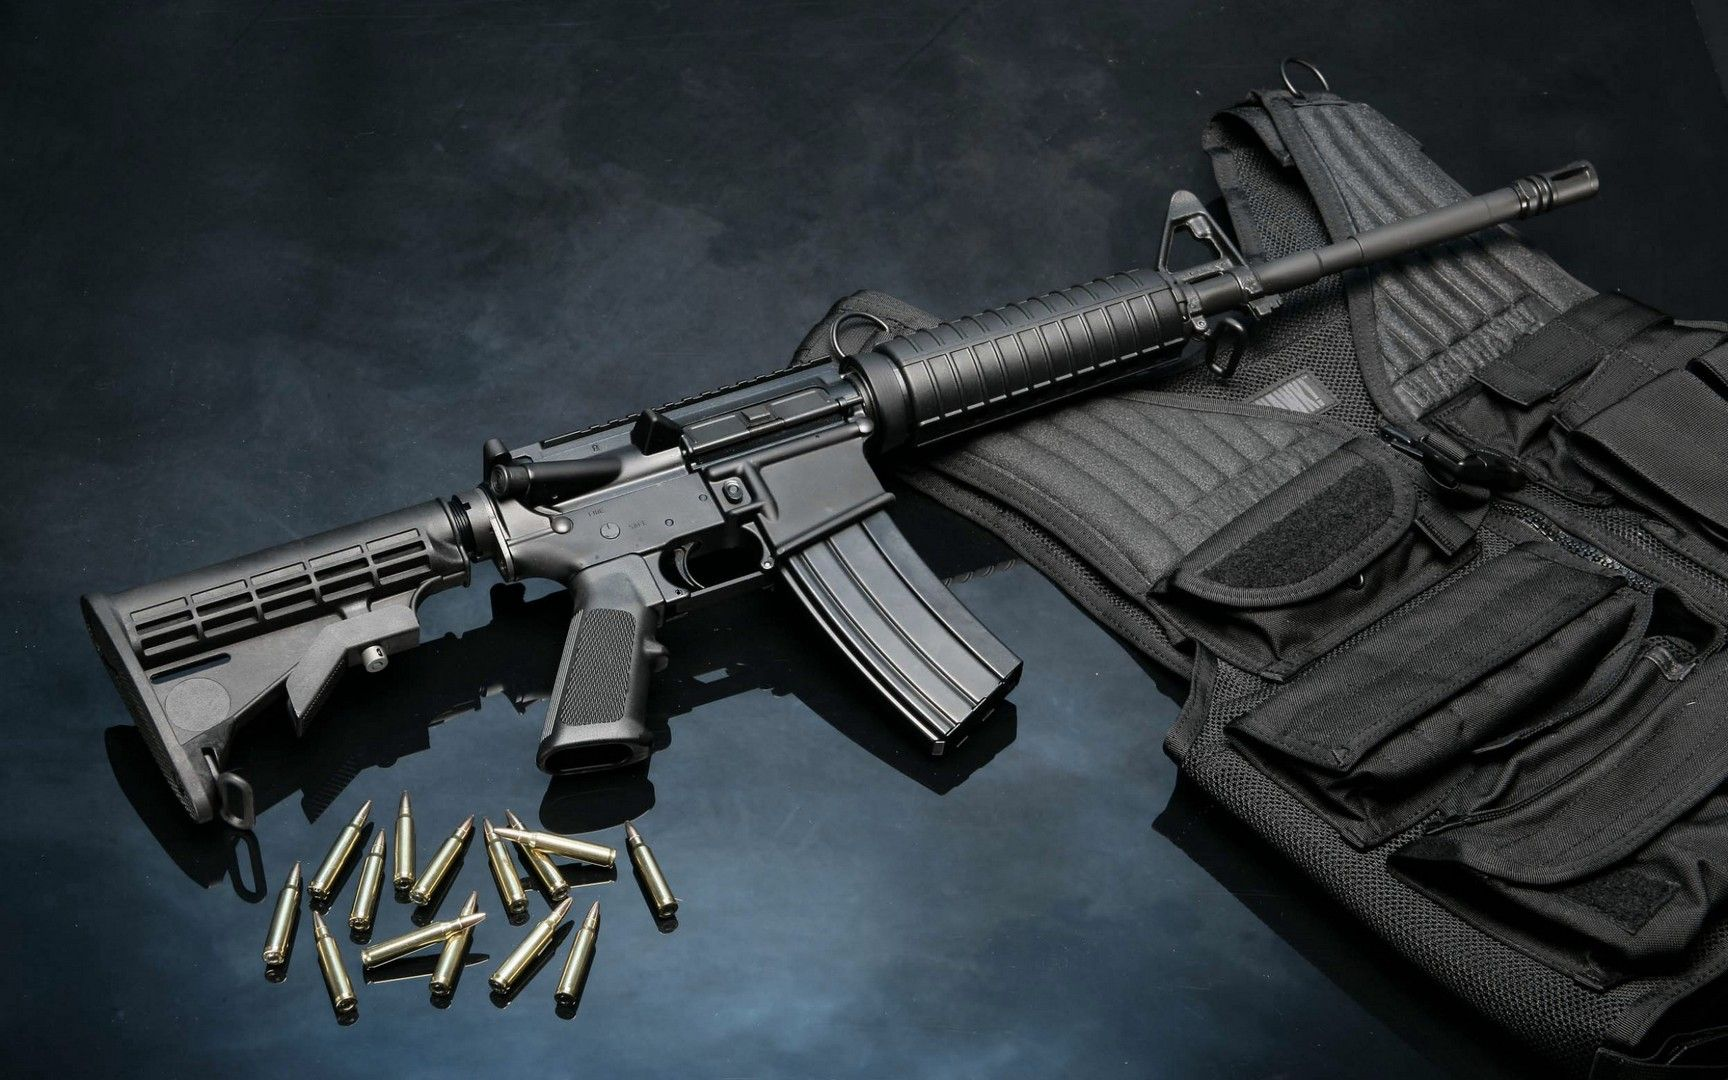 m16 gun wallpaper desktop - photo #14